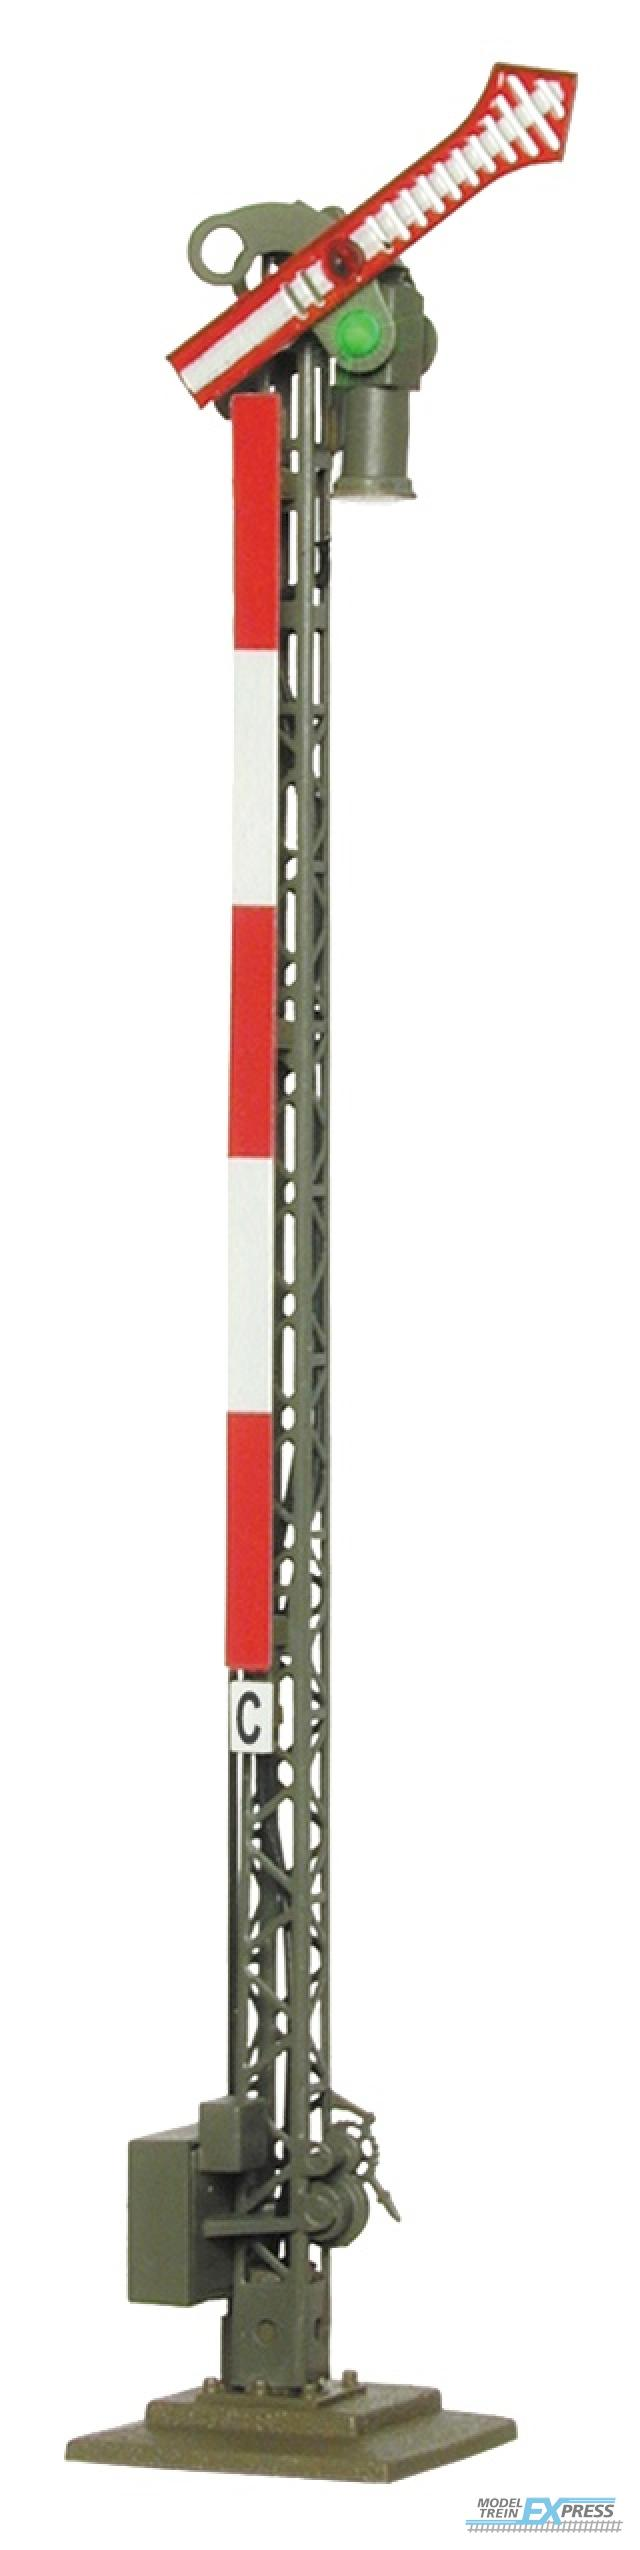 Viessmann 4505